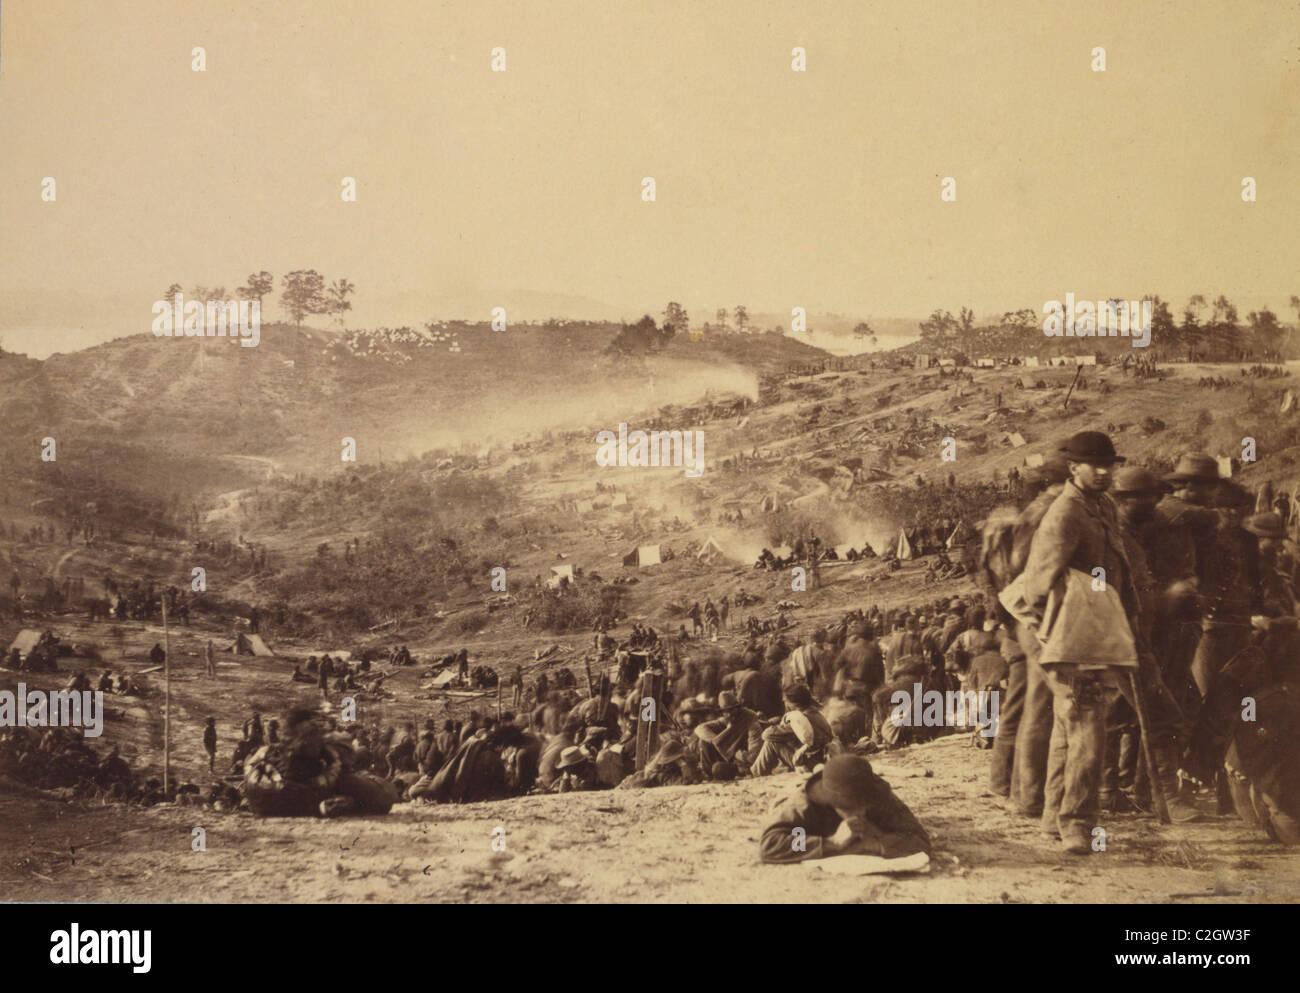 Konföderierten Gefangenen Belle Plain Landing, VA., erfasst mit Johnsons Division, 12. Mai 1864 Stockbild